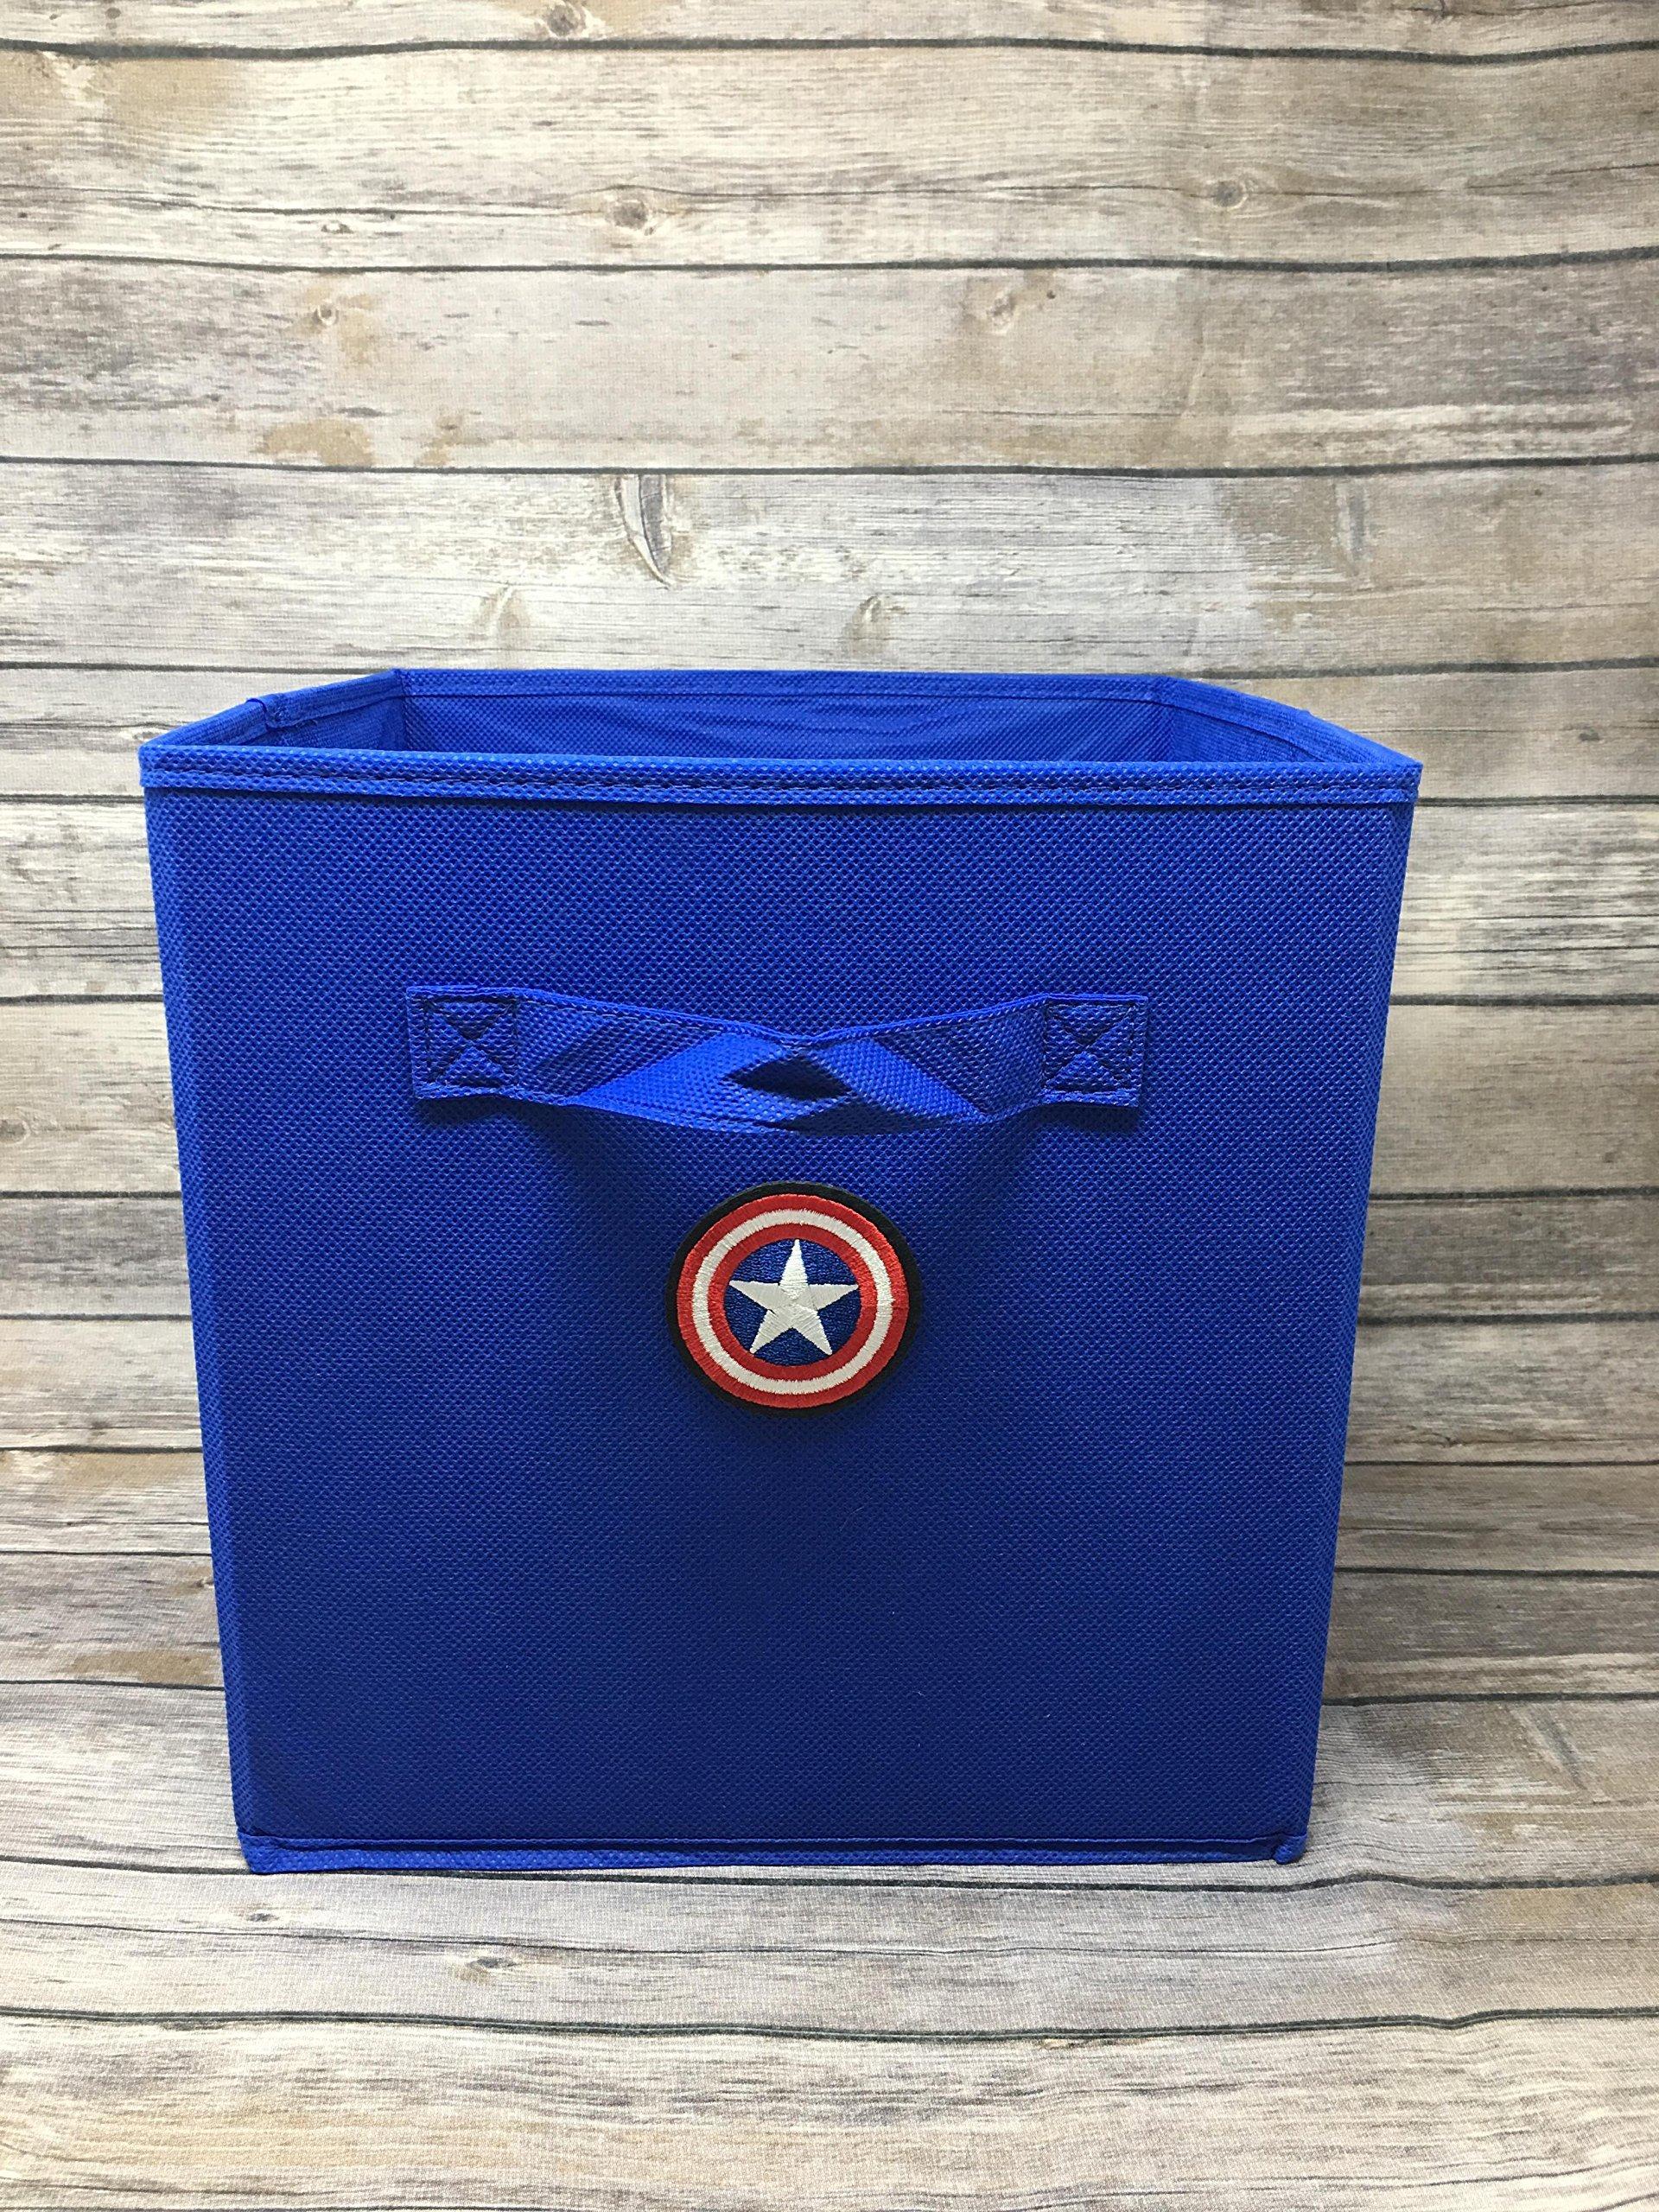 Captain America Logo Foldable Storage Cube Basket Bins Organizer,storage bins